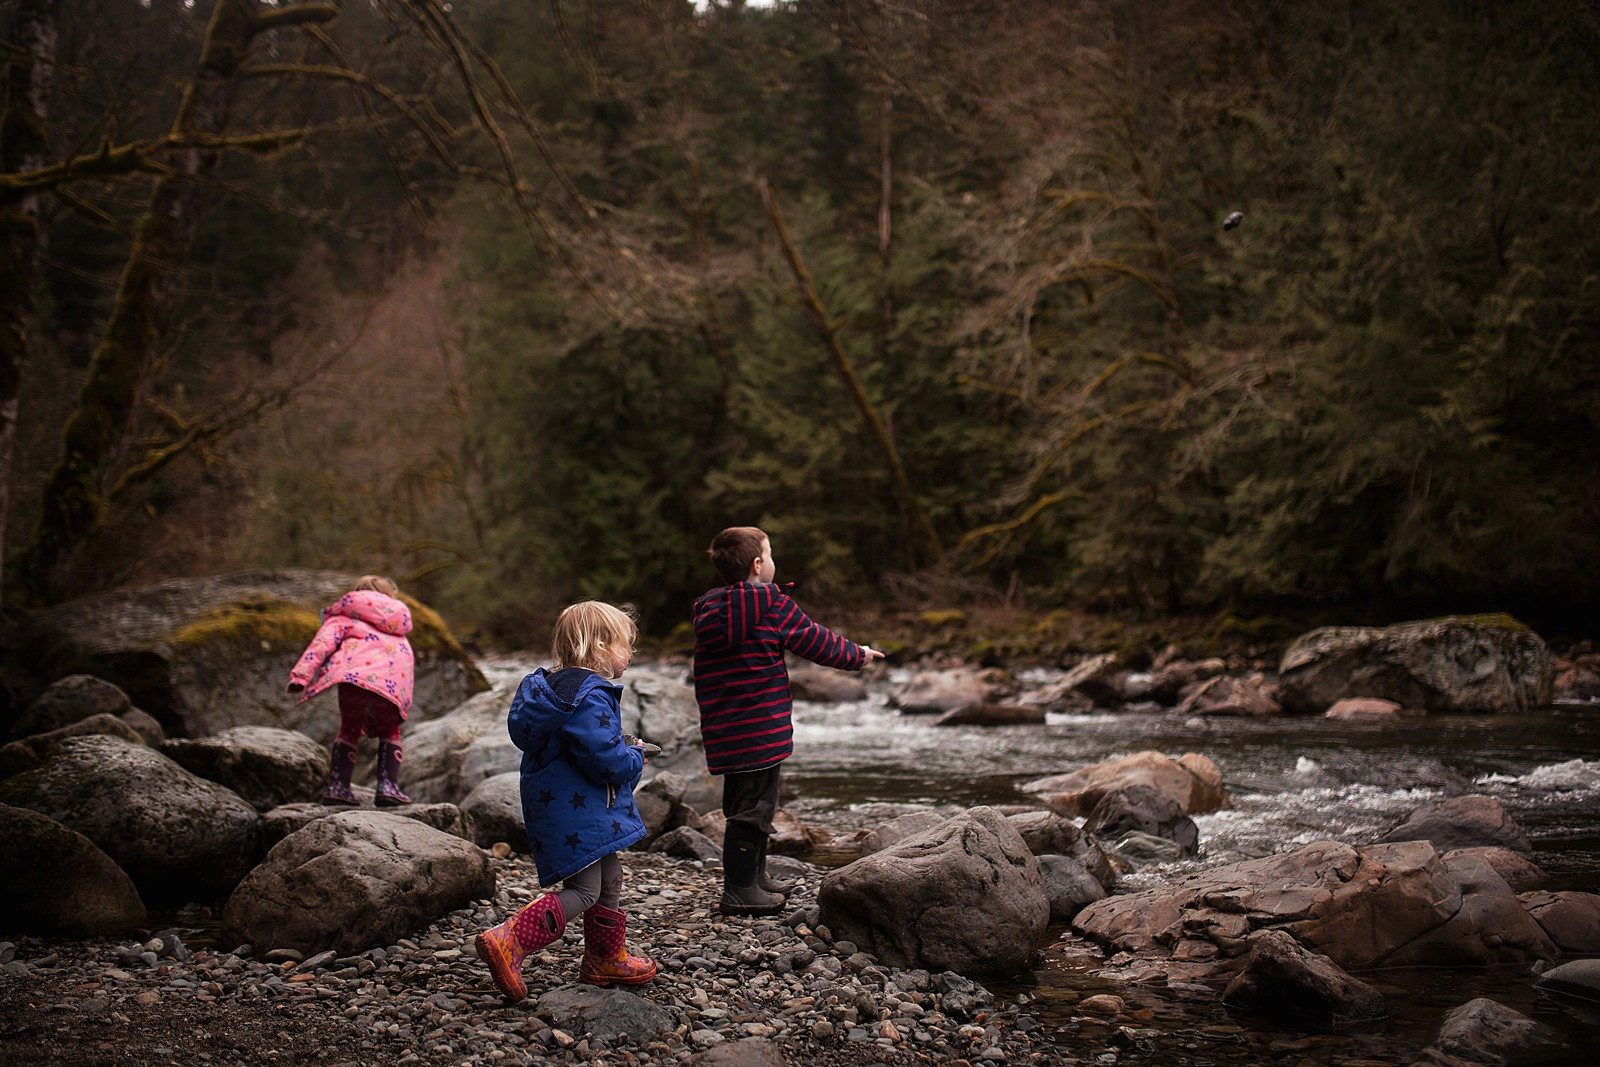 Outdoor_adventures_Neyssa_Lee_1 kids walking along rocky river bank in boots and coats